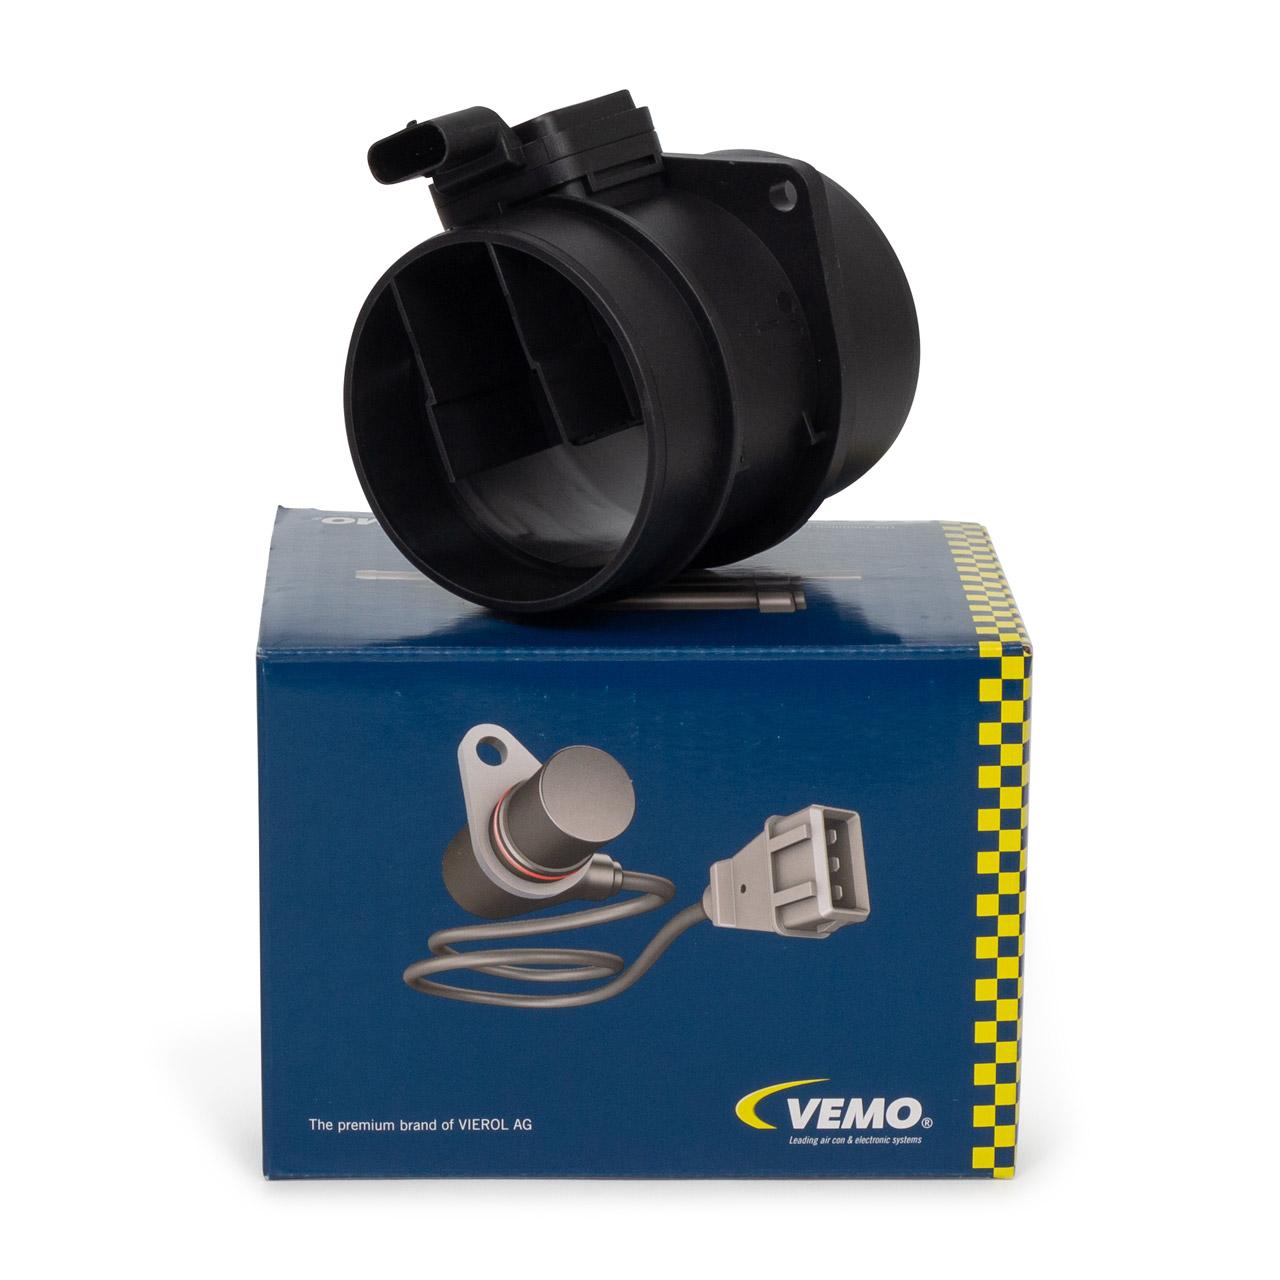 VEMO Luftmassenmesser MERCEDES W204 S204 W212 R172 W166 X204 180-250 CDI 6510900248